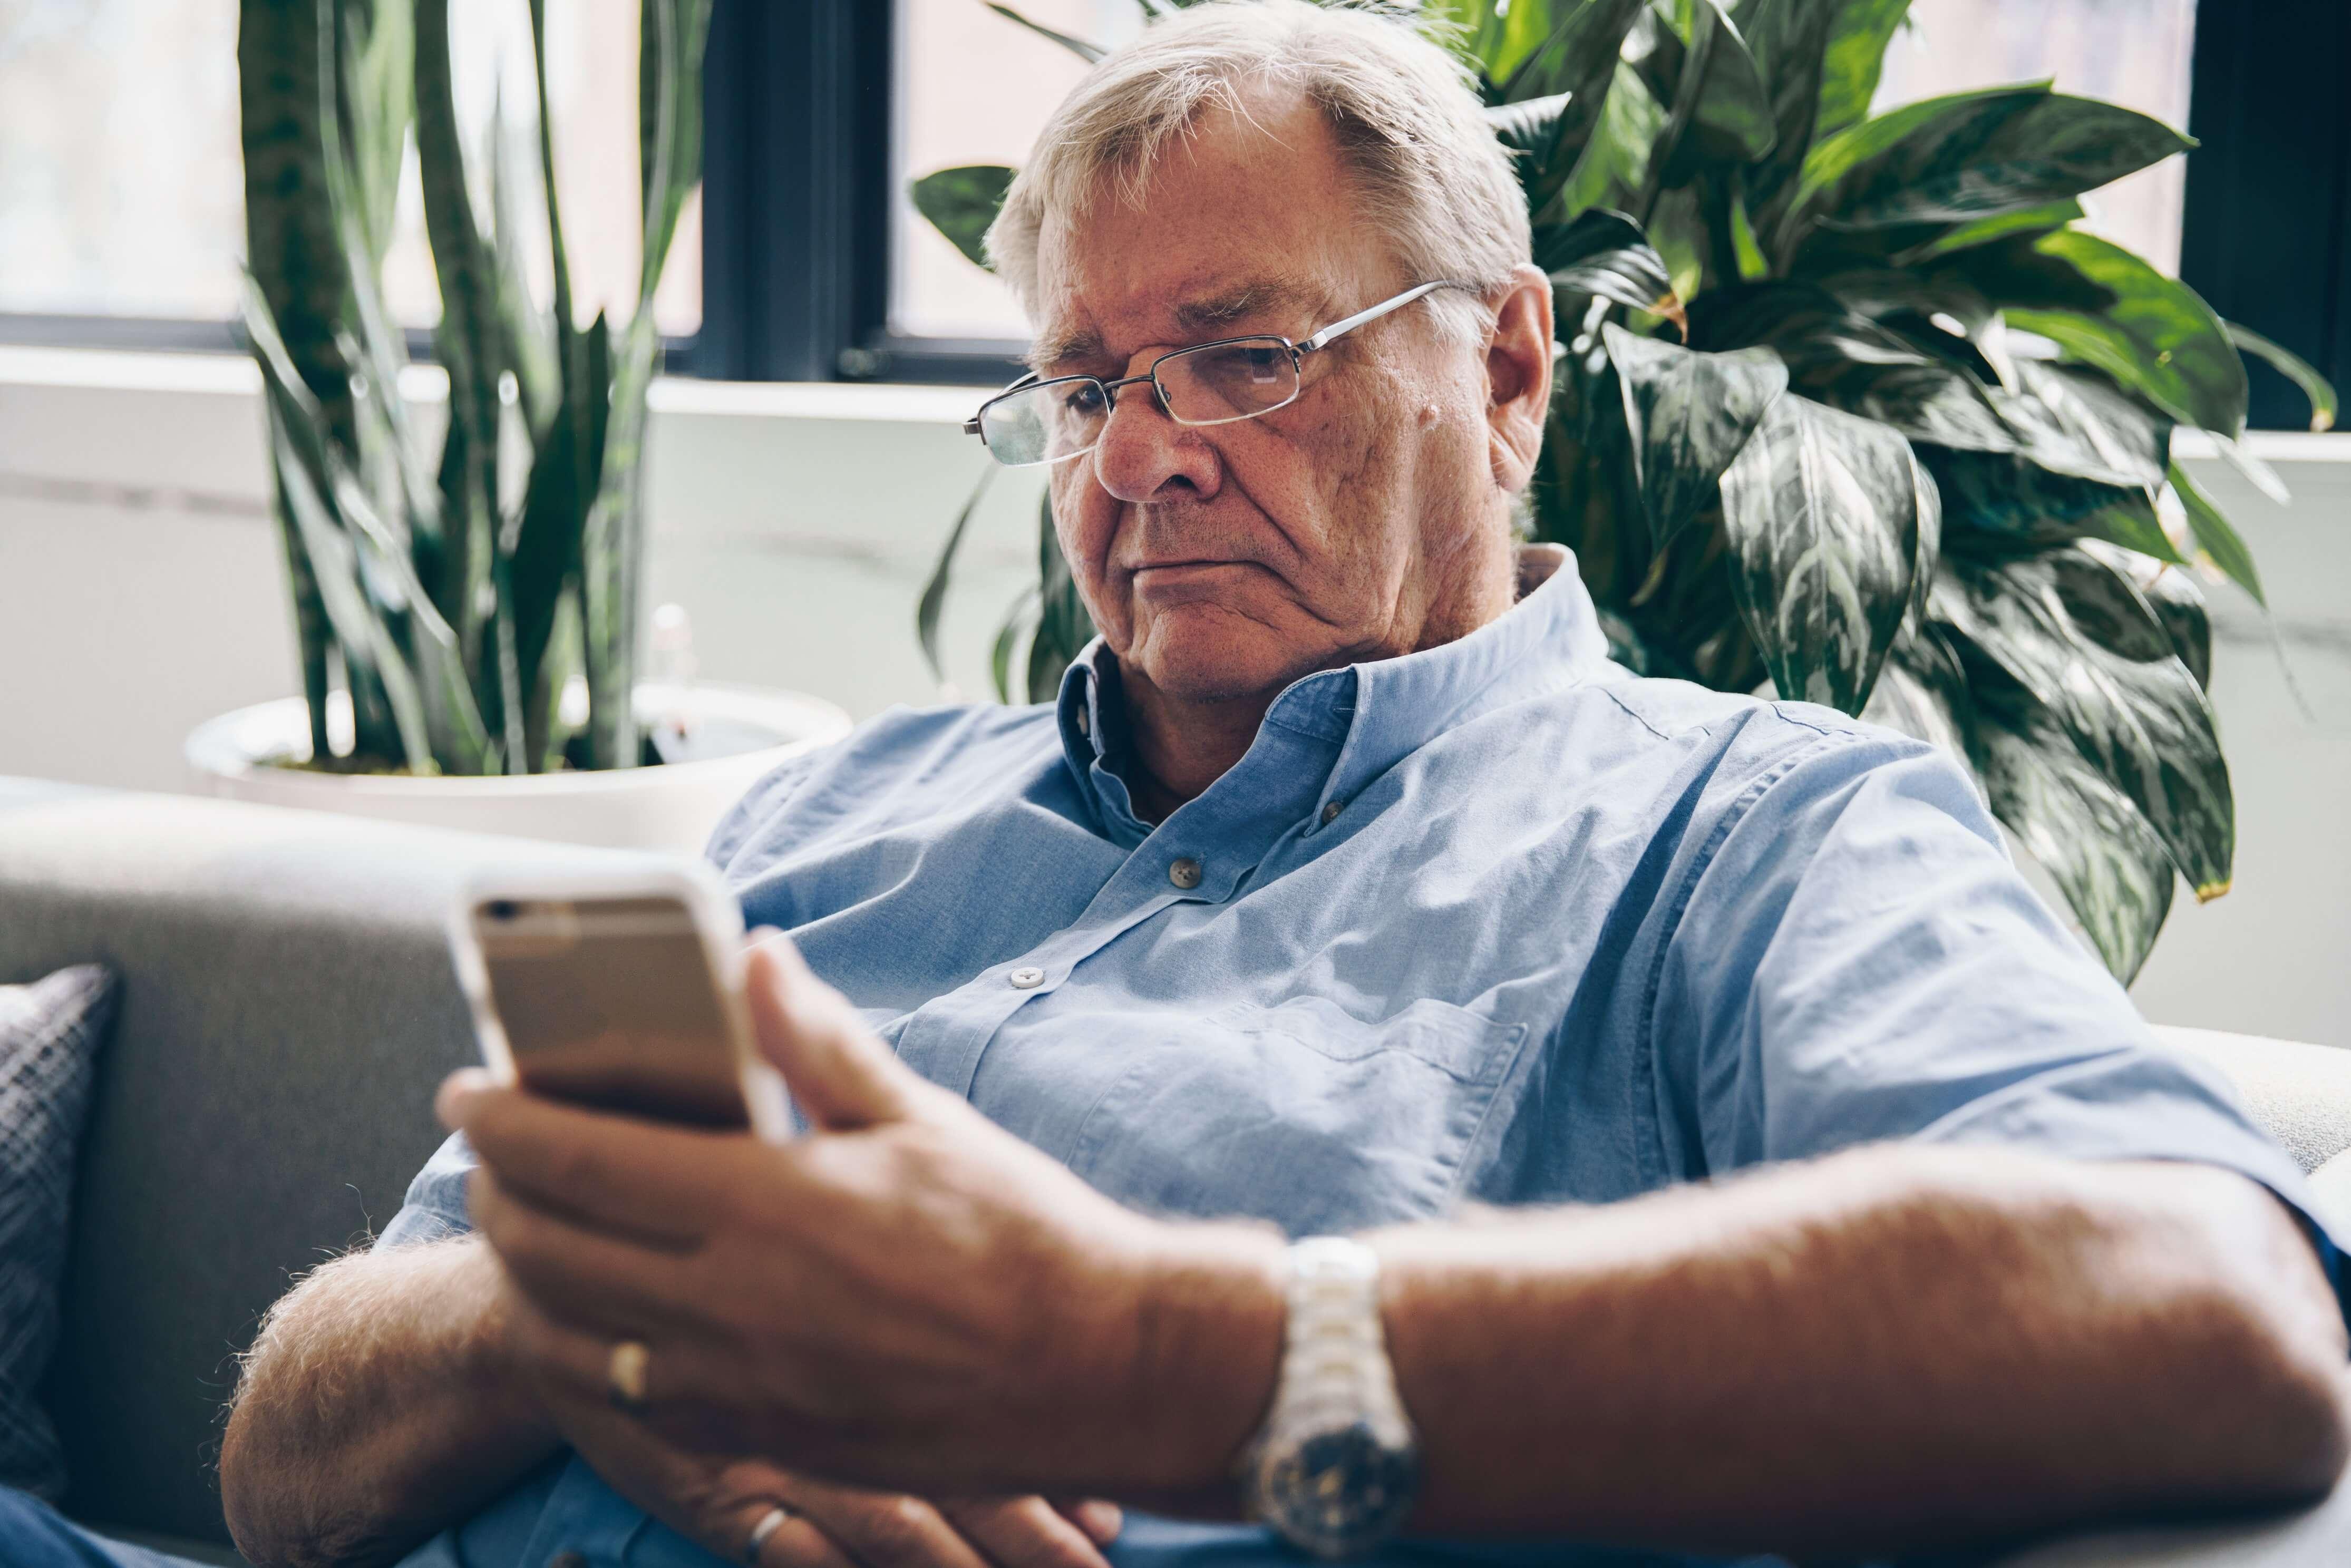 senior-using-cell-phone